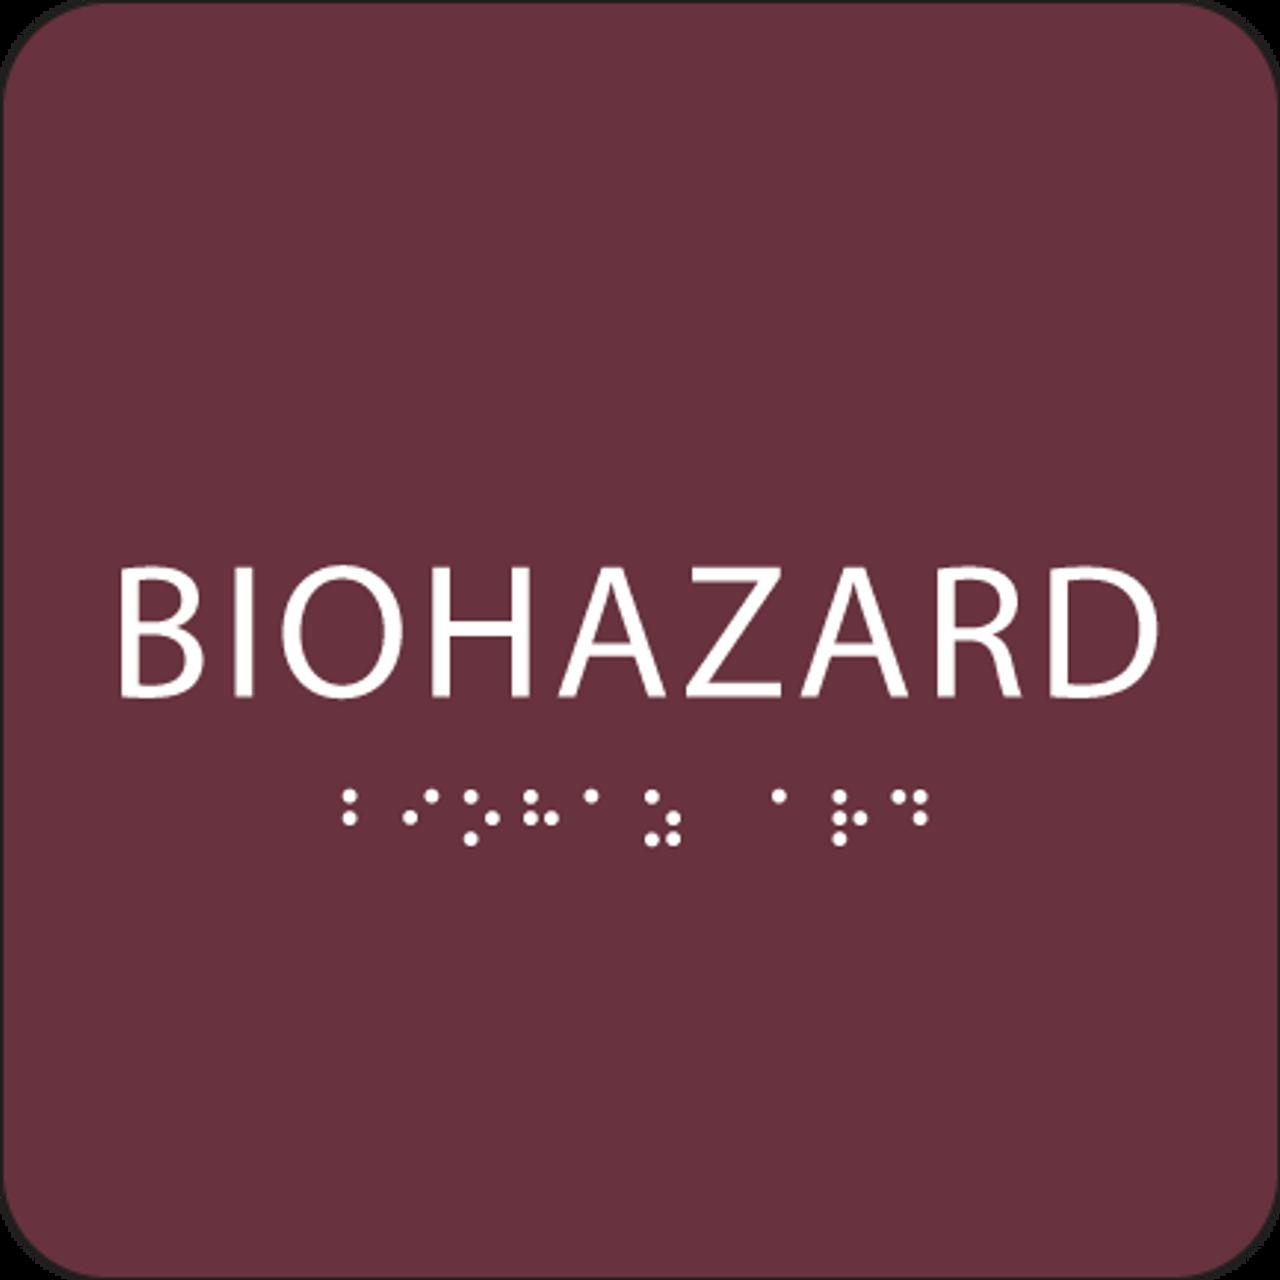 Burgundy Biohazard ADA Sign